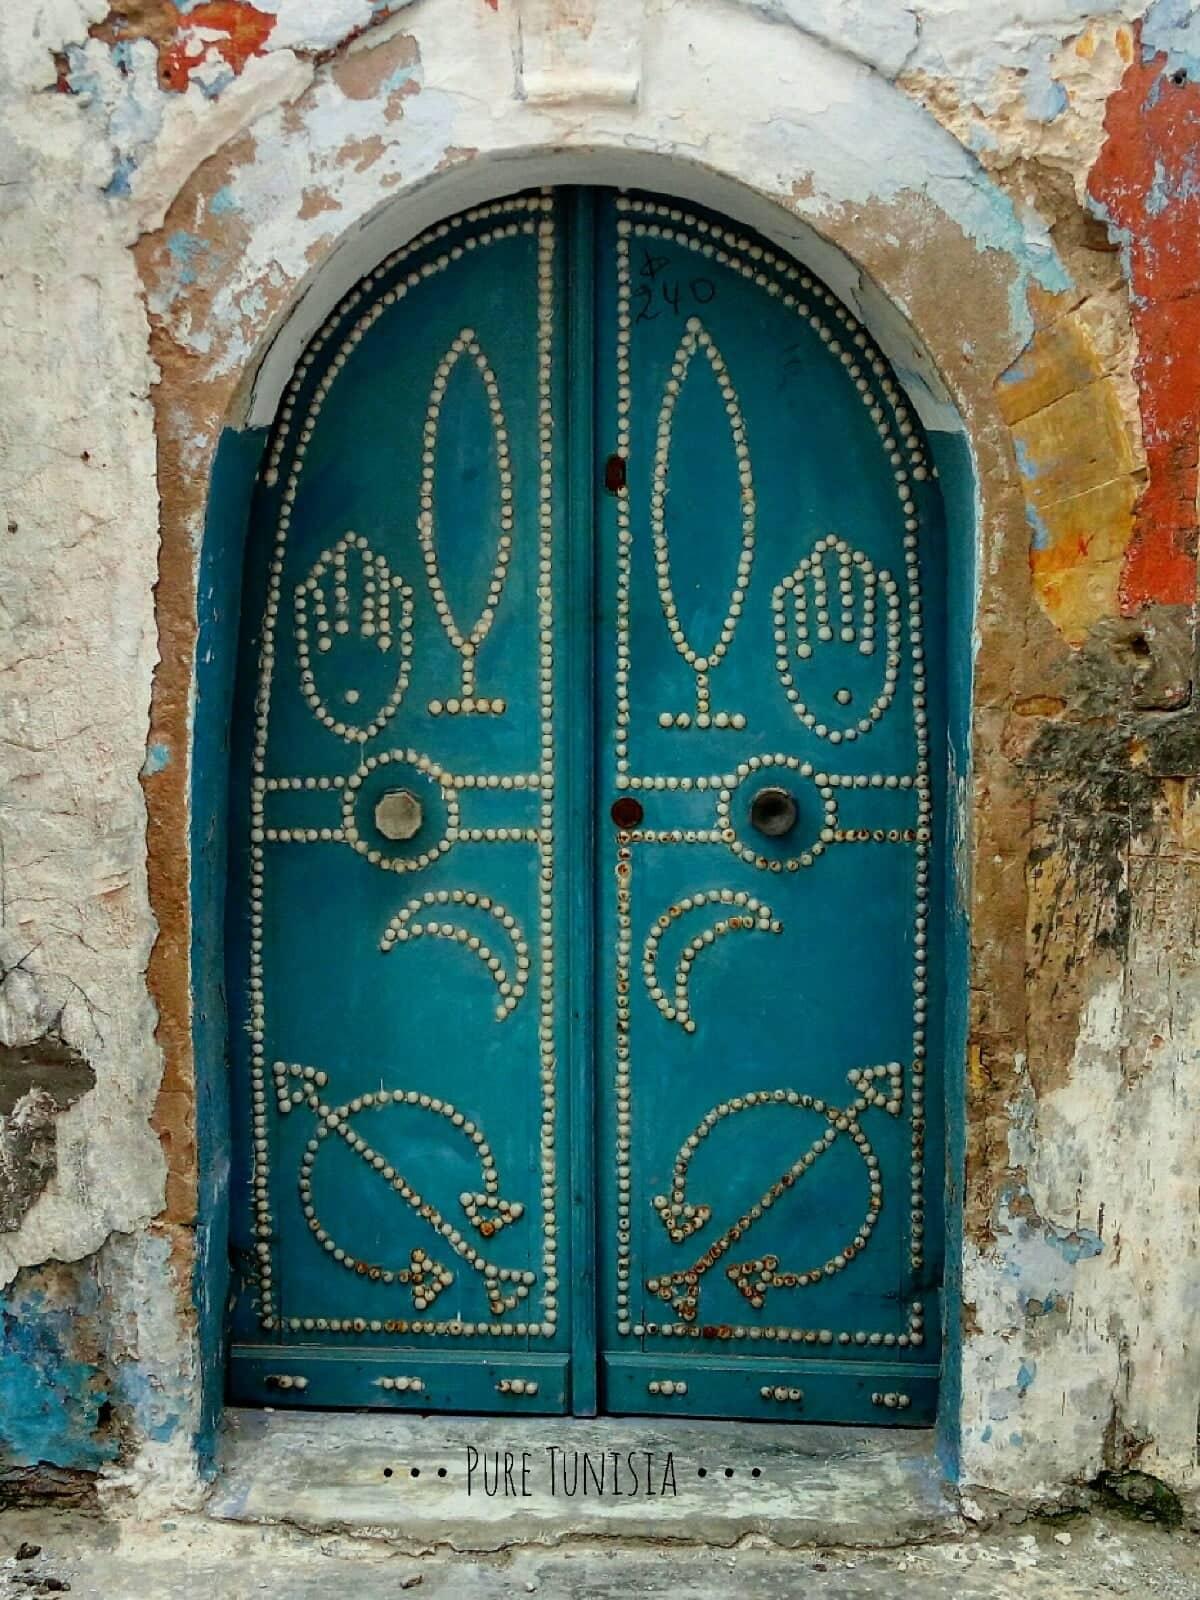 Pure Tunisia - The Mediterranean Lifestyle